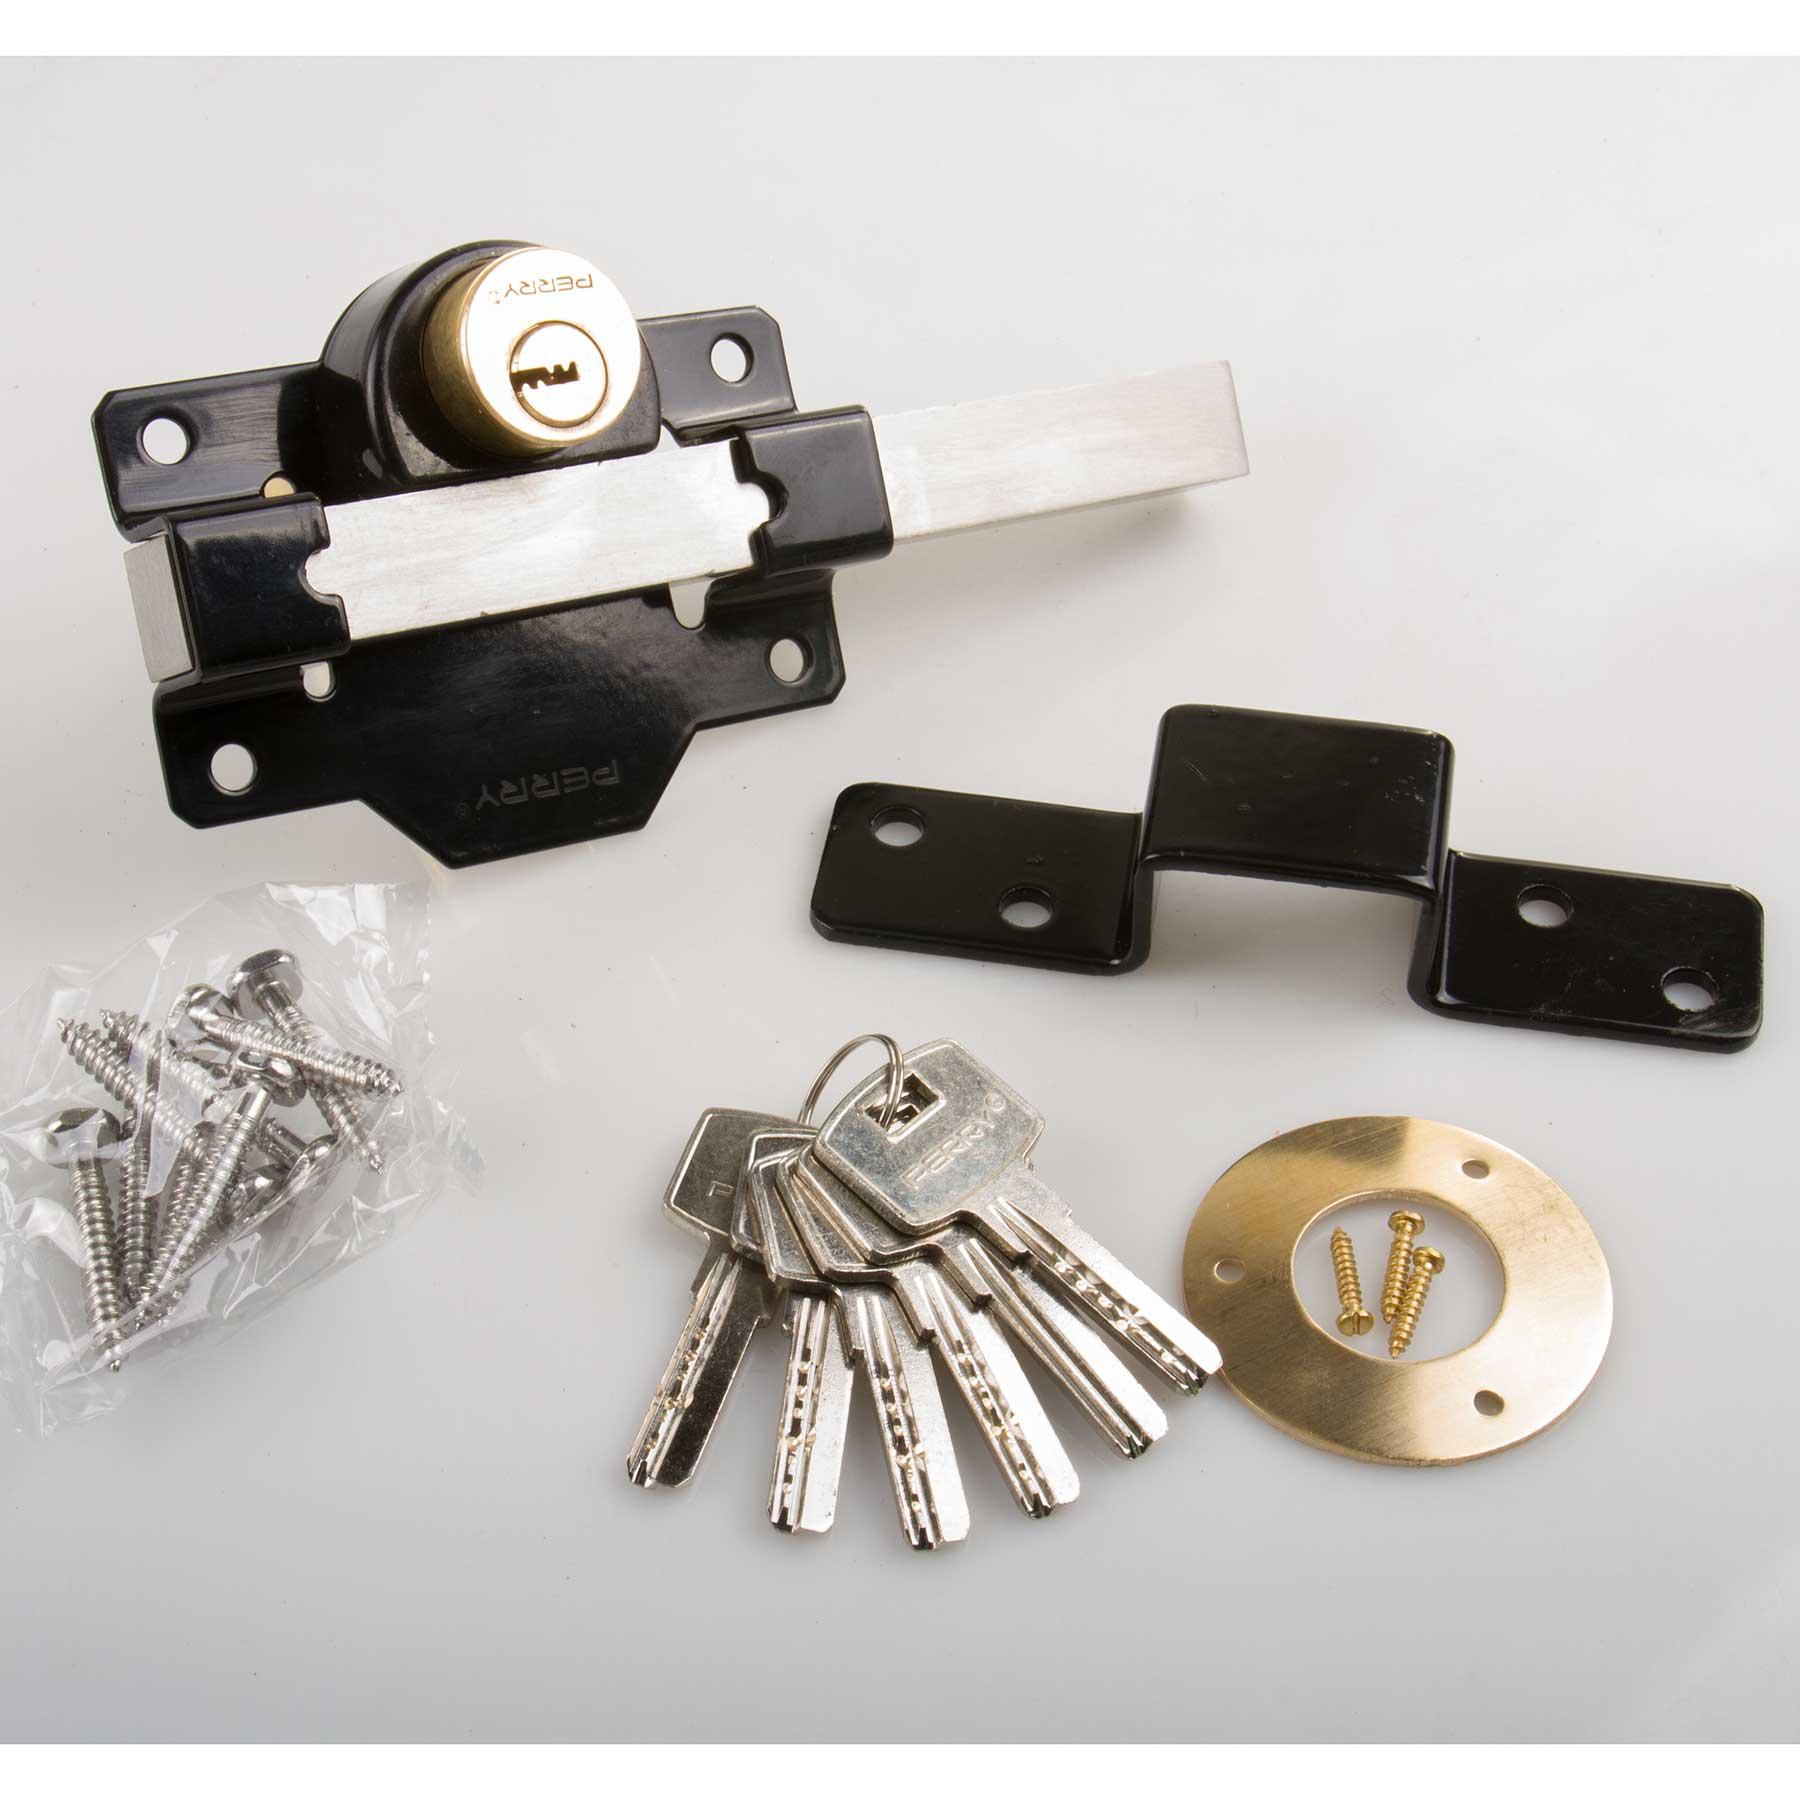 A Perry High Security Long Throw Garden Gate Door Lock 5